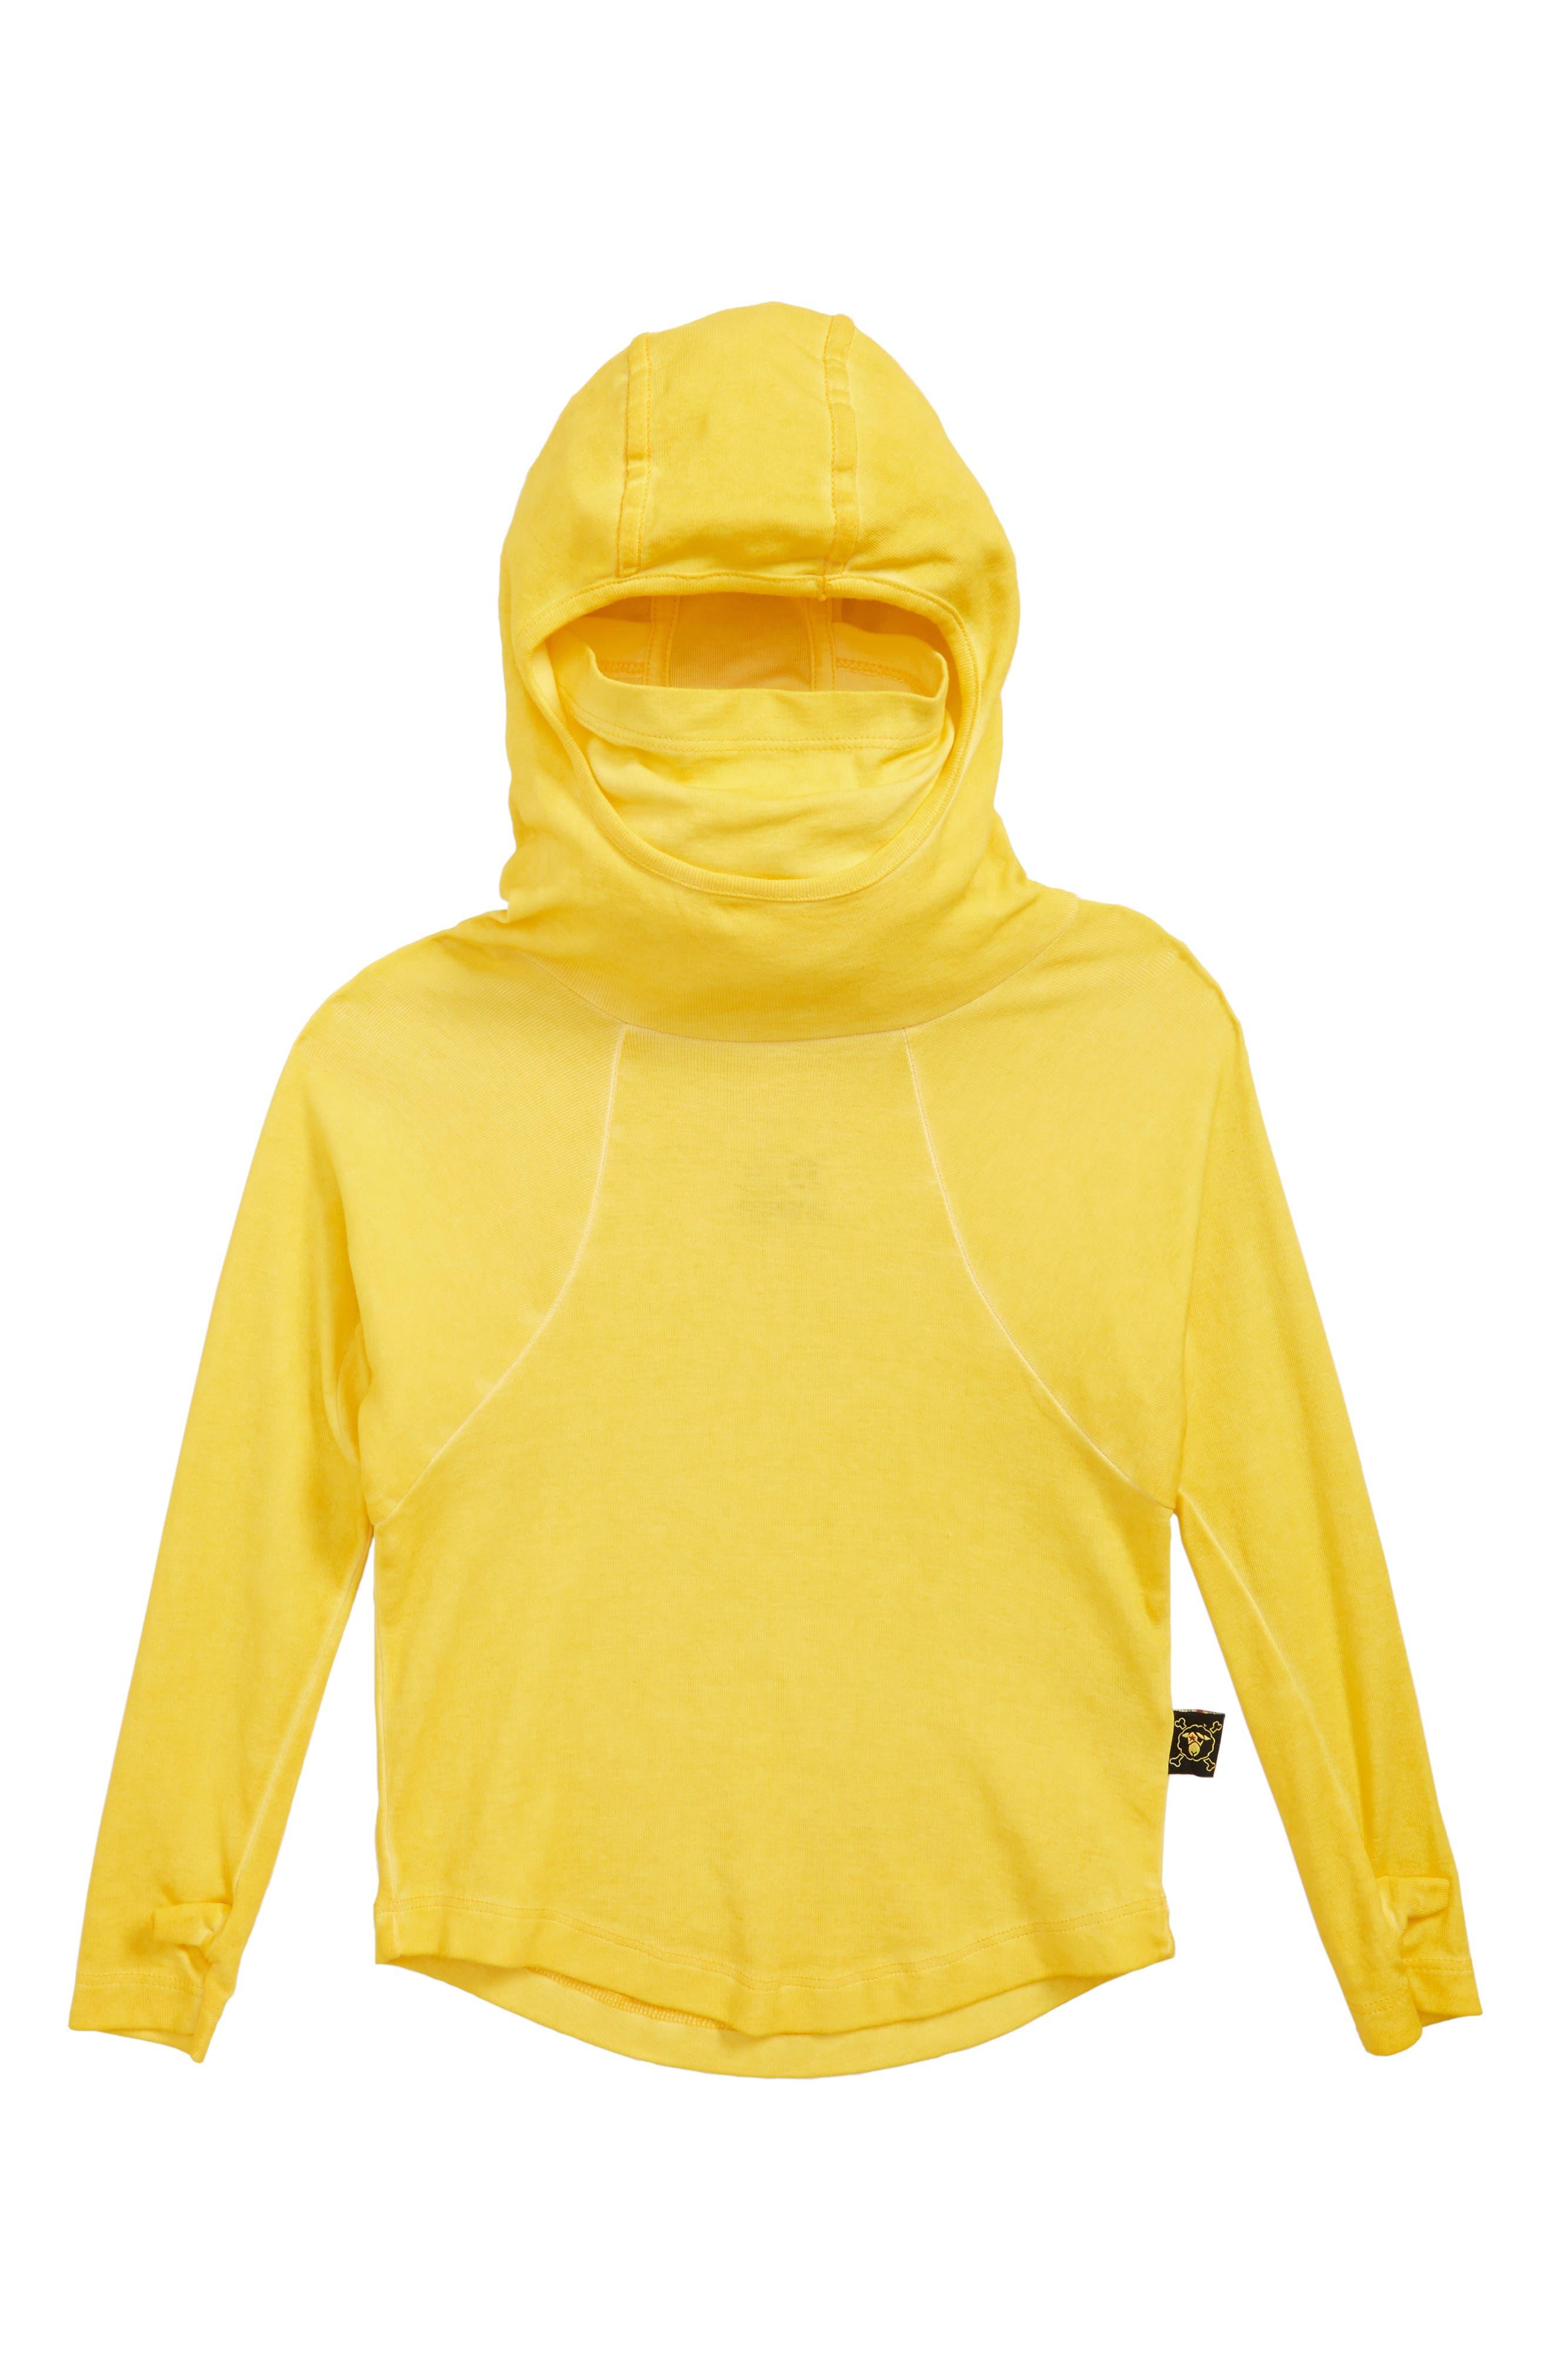 Ninja Hooded Shirt,                         Main,                         color, DUSTY YELLOW